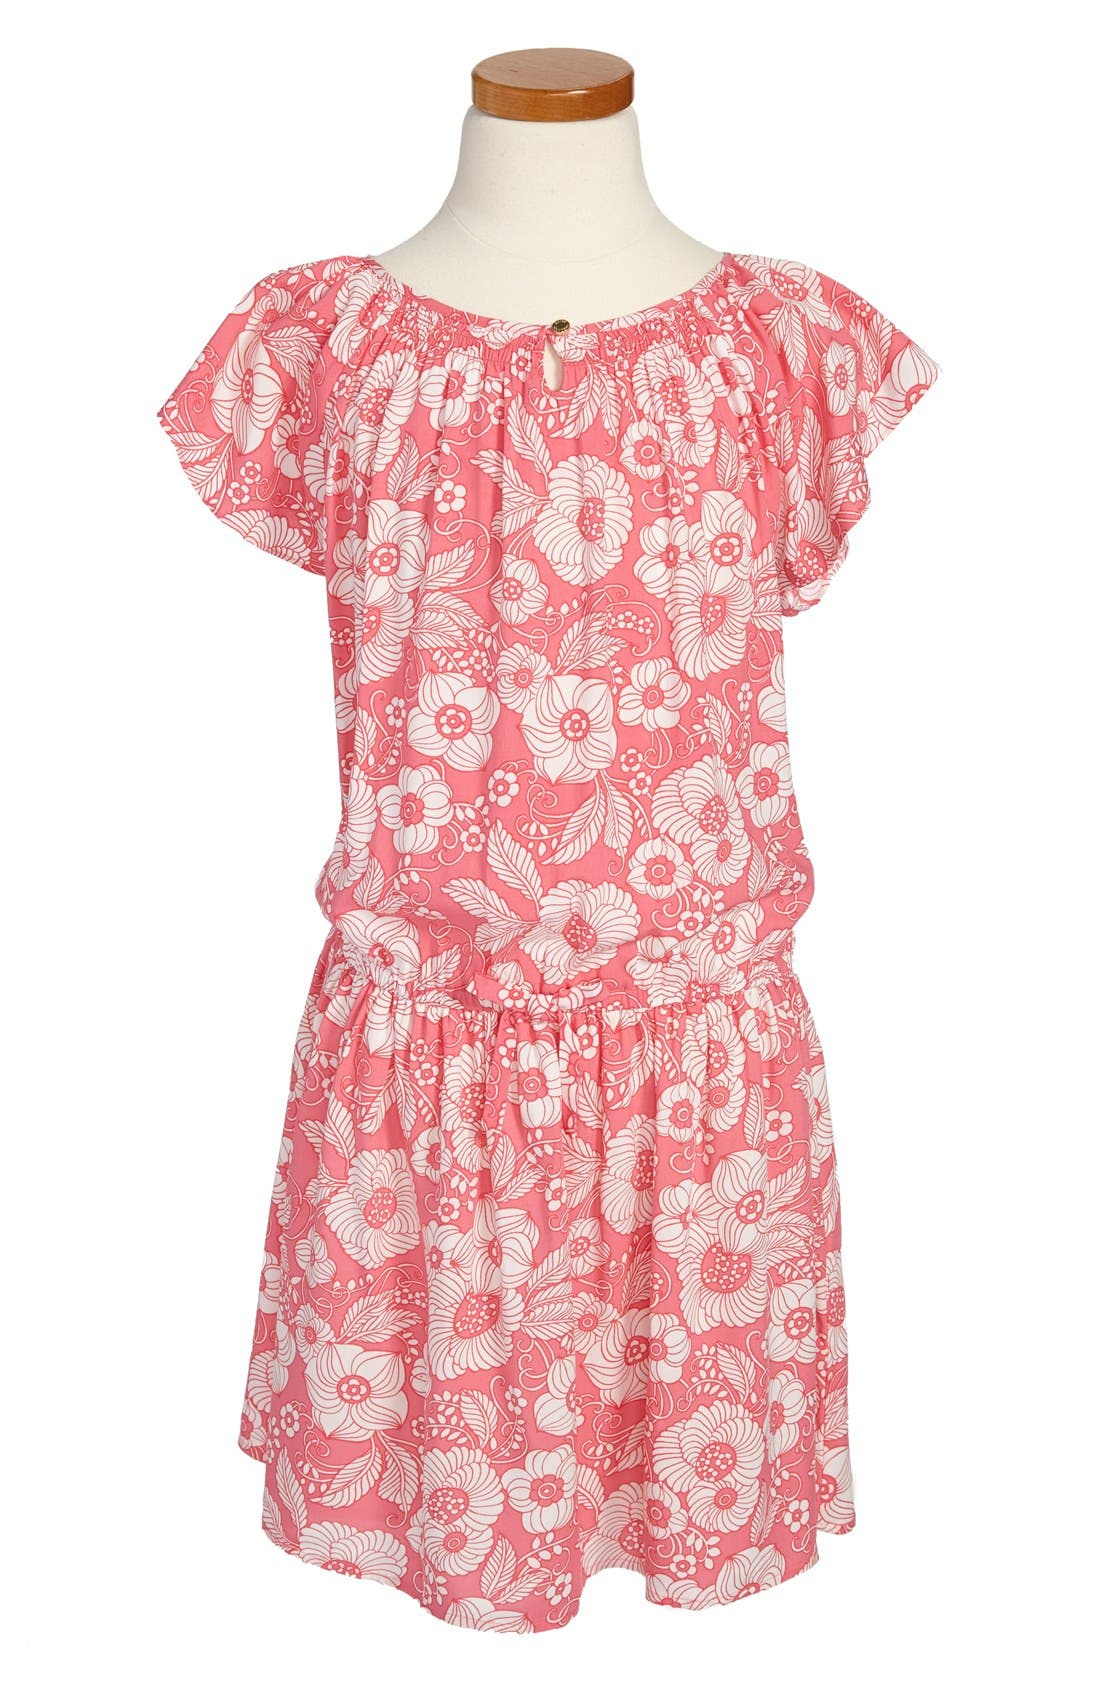 Alternate Image 1 Selected - Juicy Couture 'Vanity Scroll' Dress (Little Girls & Big Girls)